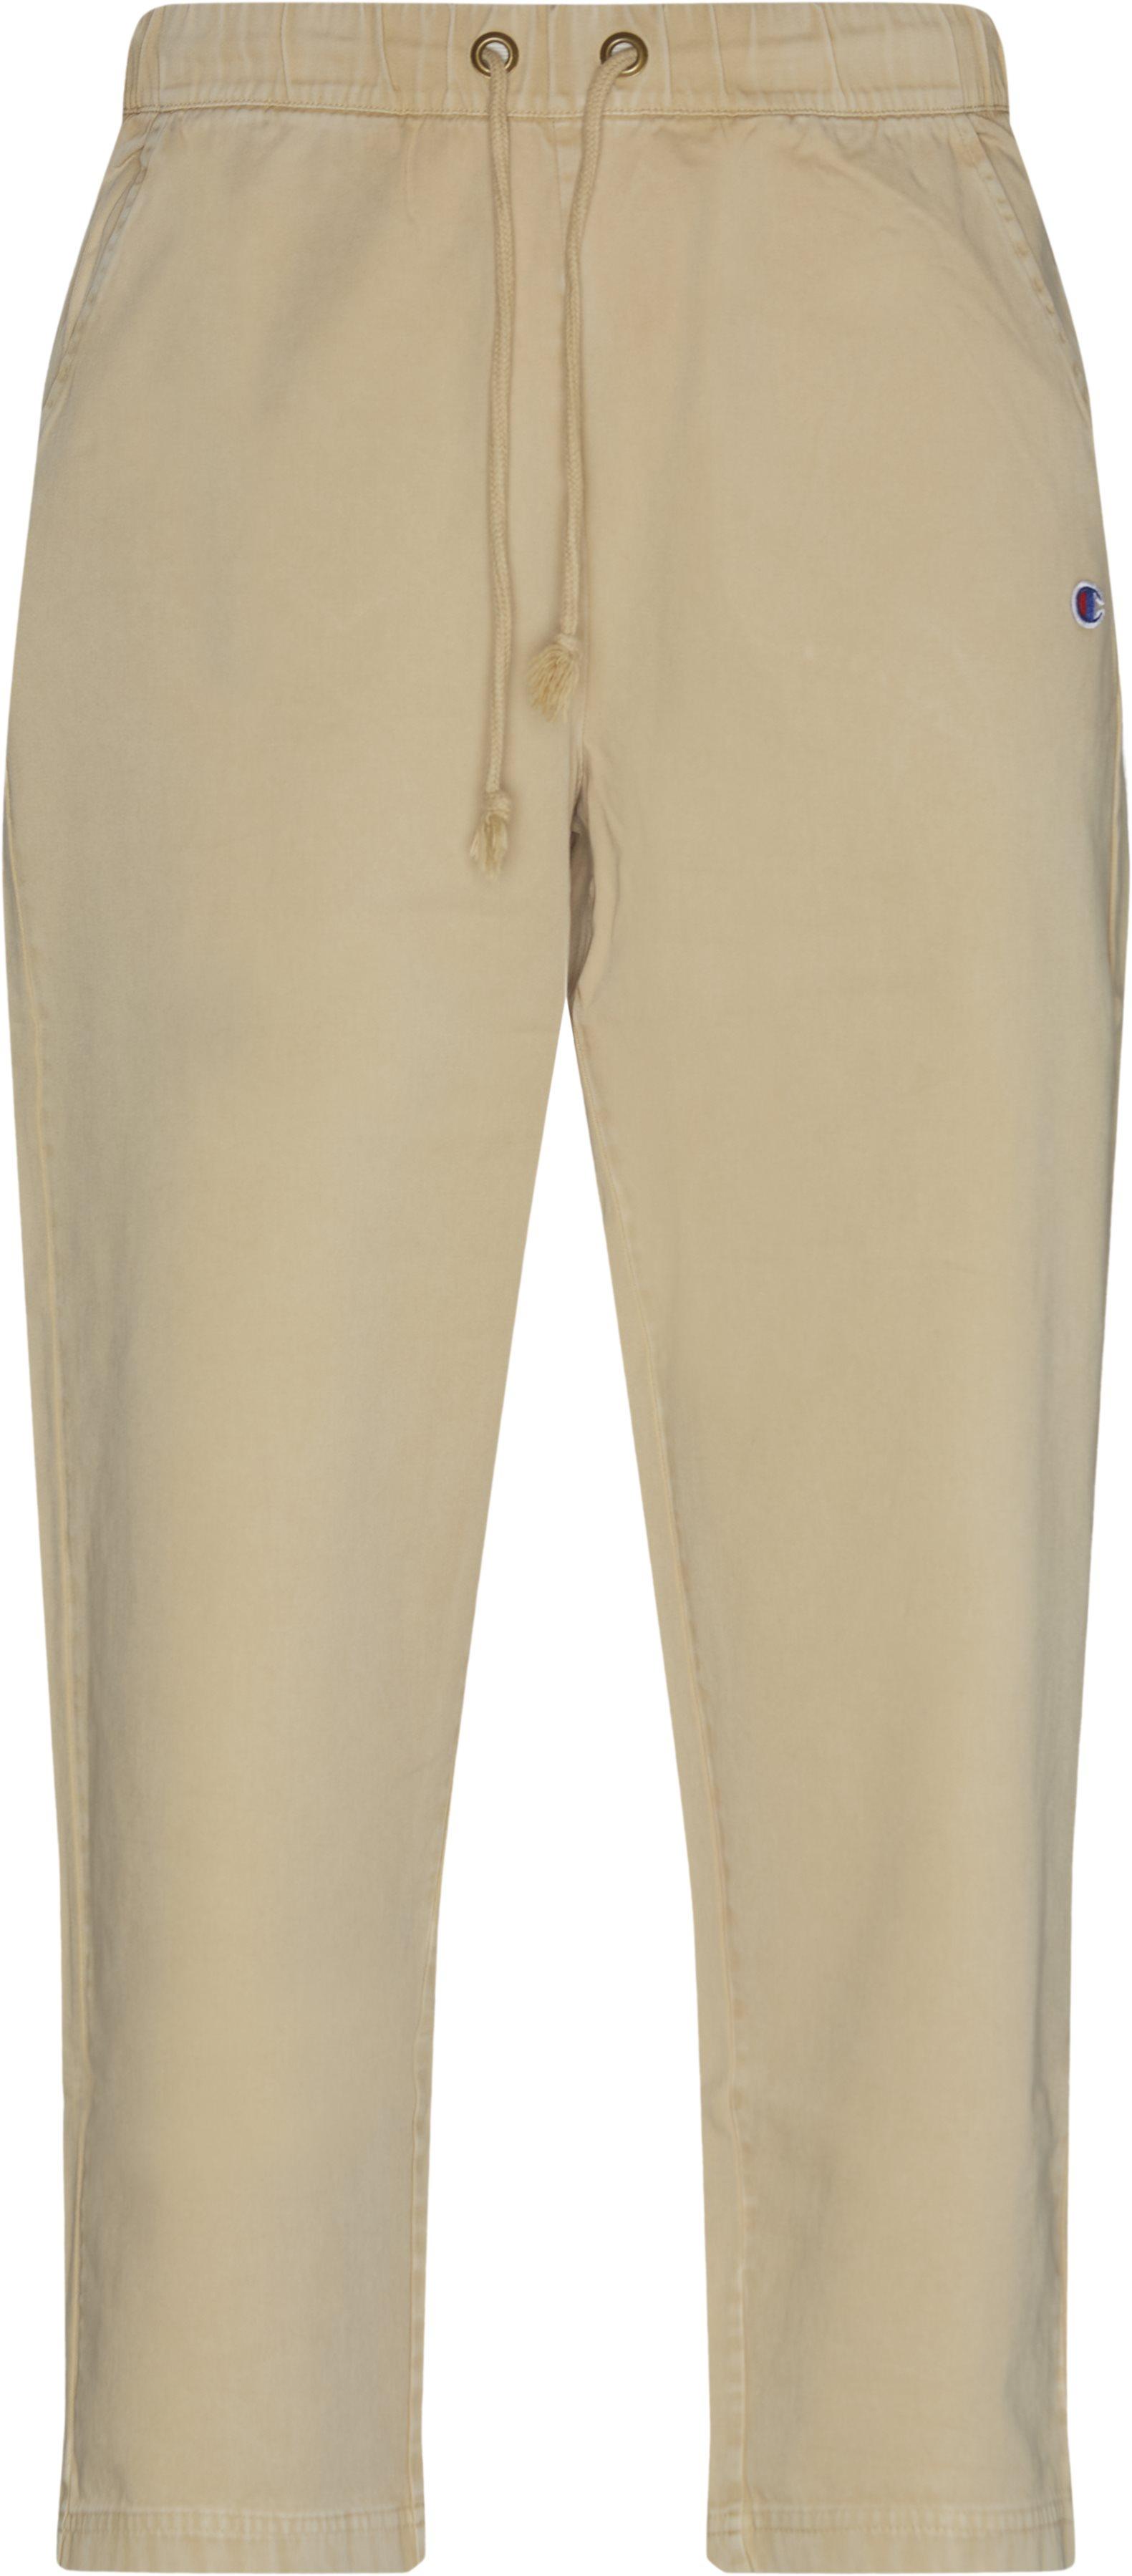 Logo Comfort Pant - Byxor - Loose fit - Sand